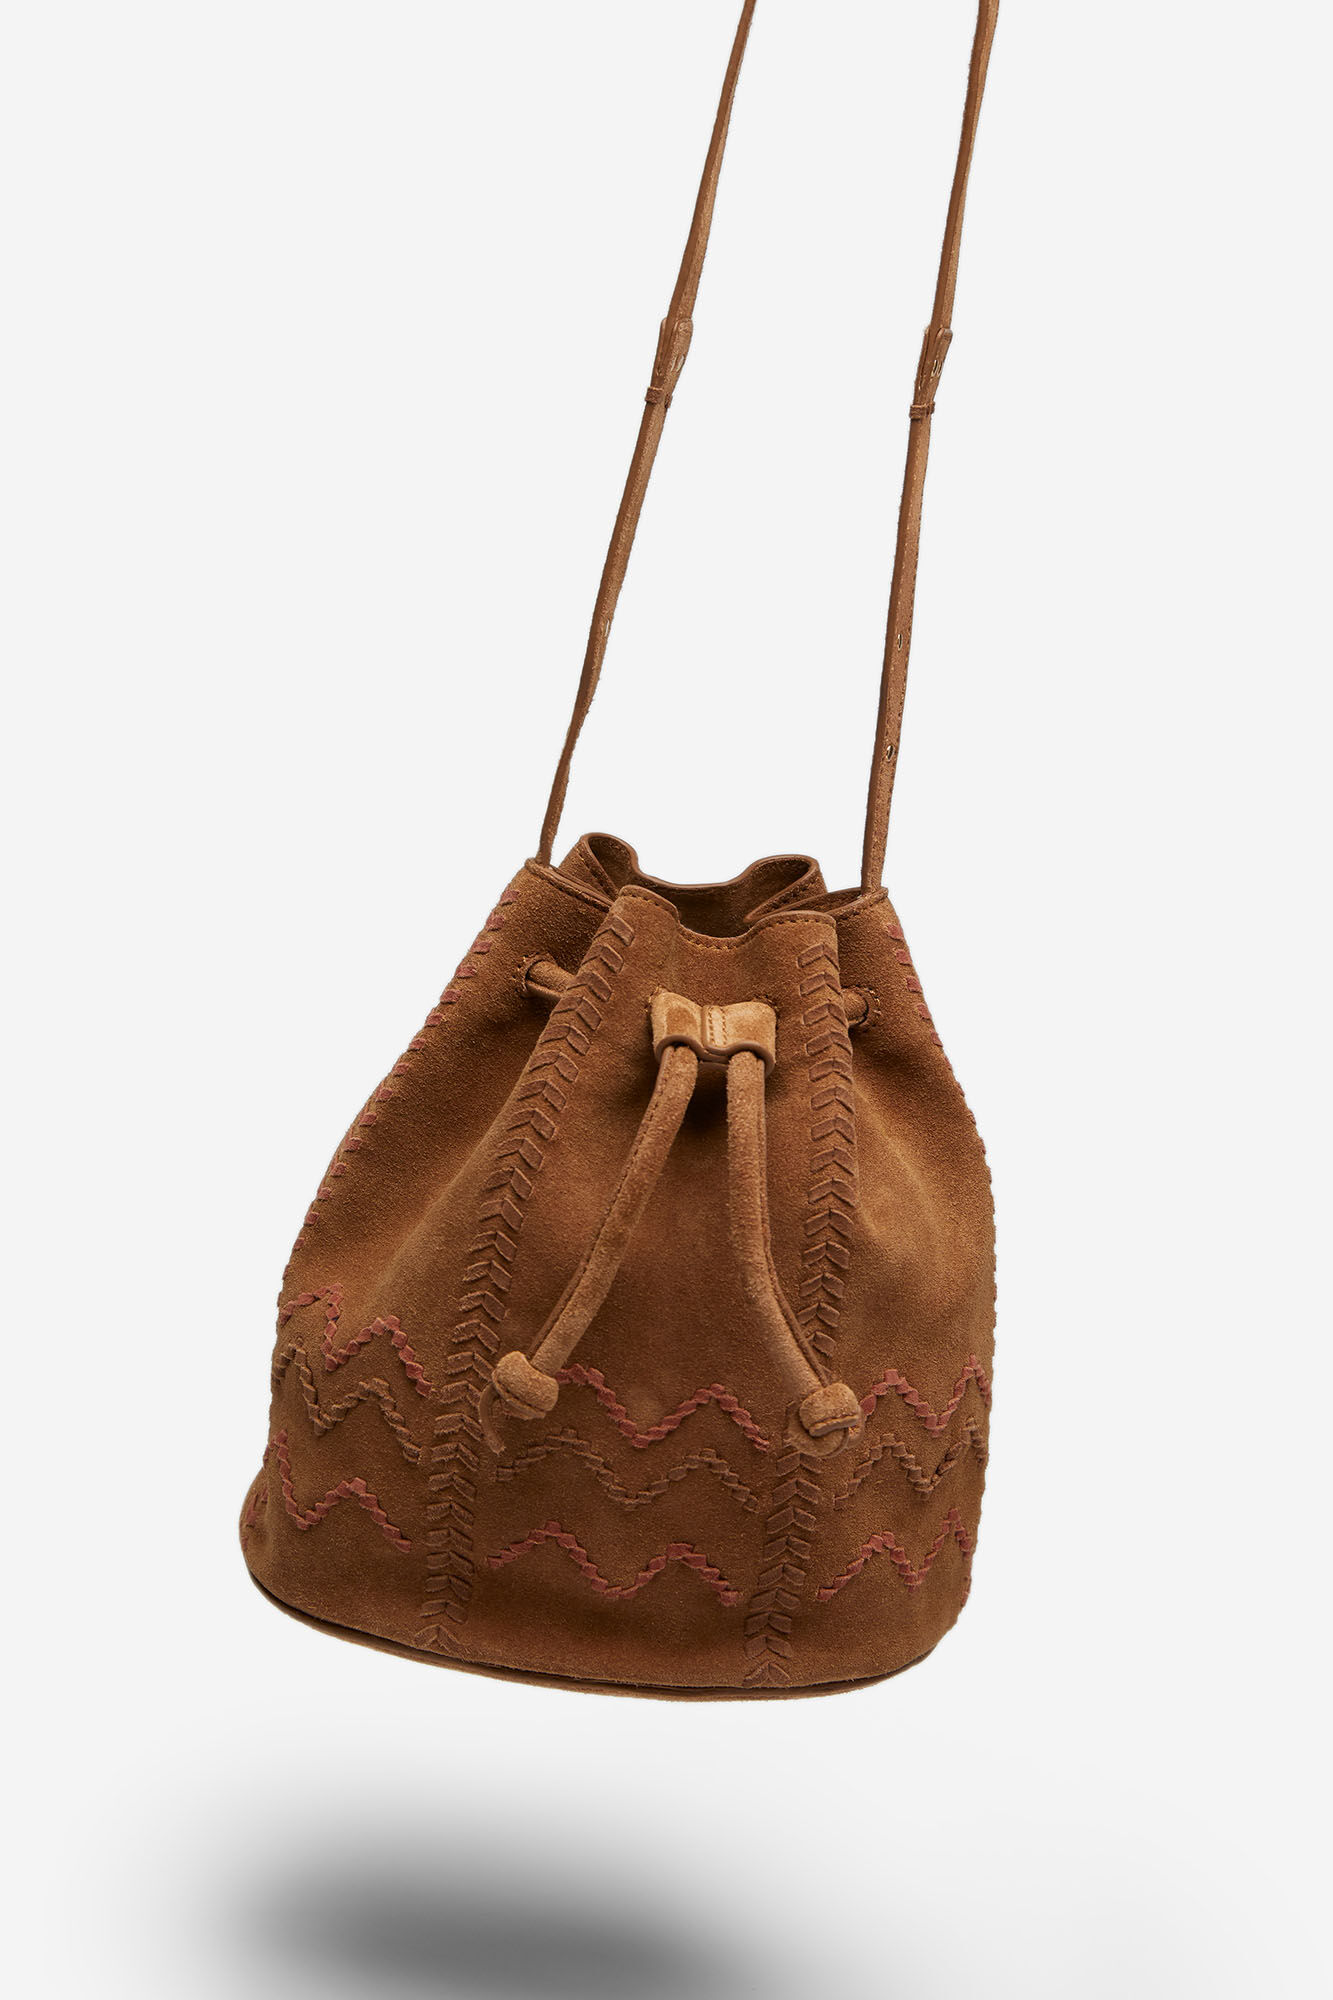 Split Leather Bucket Bag Accessories Springfield Man Woman